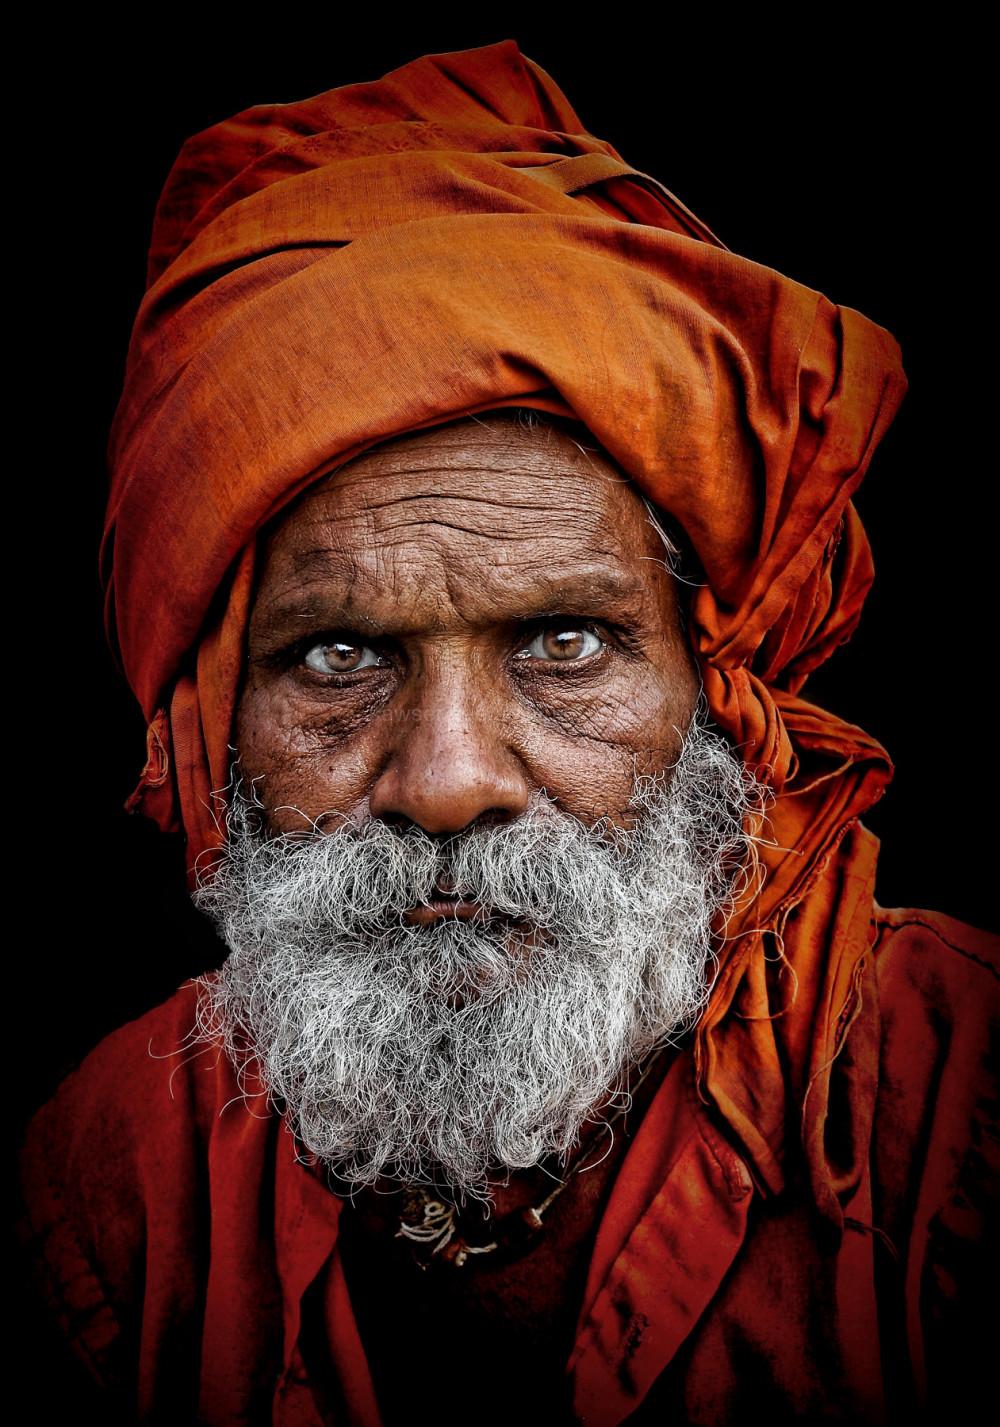 hindu pilgrim saffron colour street portrait India